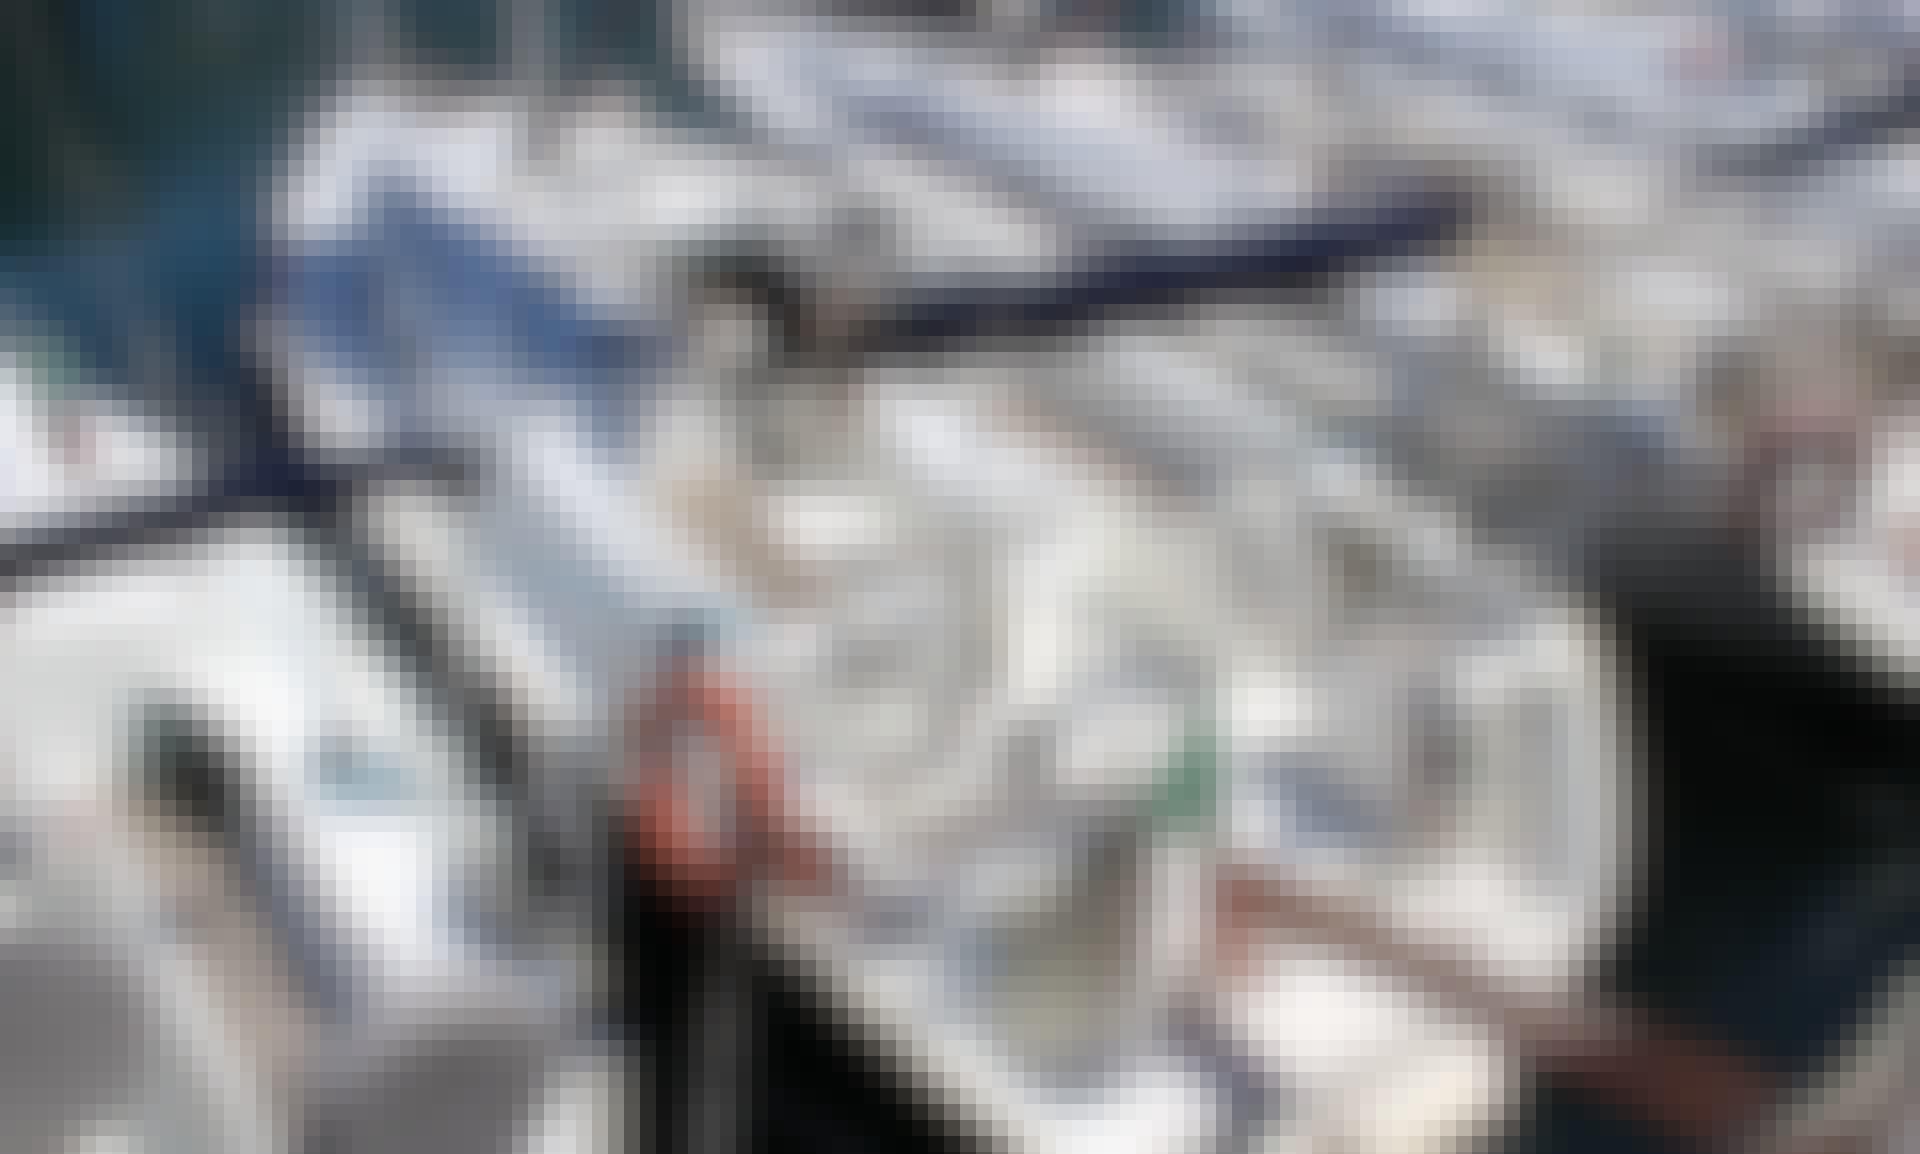 Cyclades 39.3 Sailing Yacht Charter in Genoa, Liguria